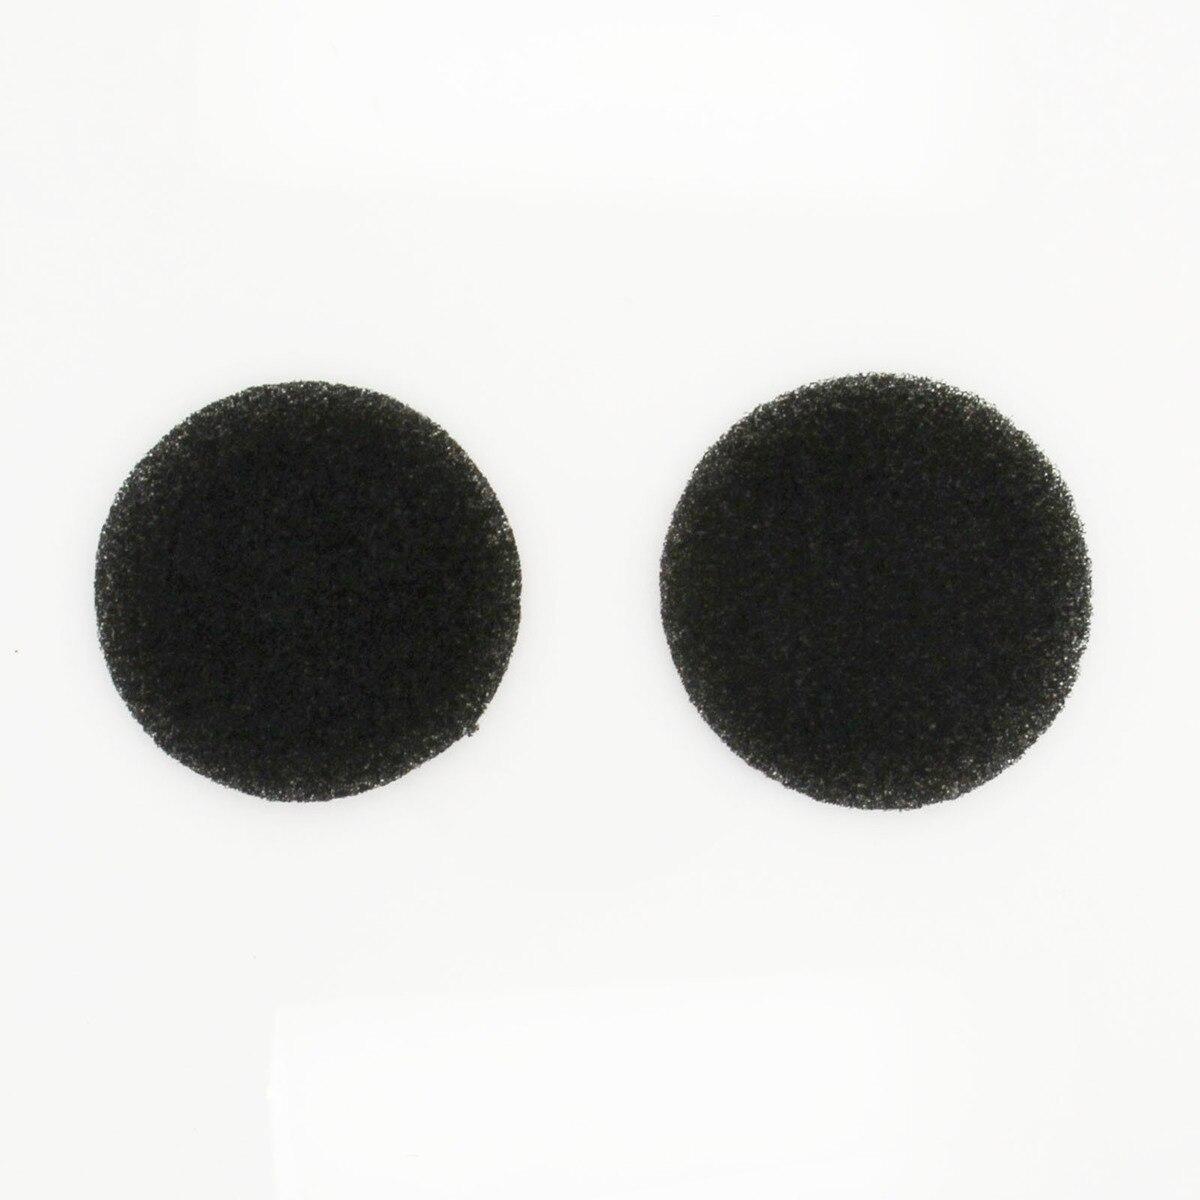 Replacement Ear Pads Cushion Earpad For AKG K121 K121S K141 MK II K142 HD Headset headphones enlarge